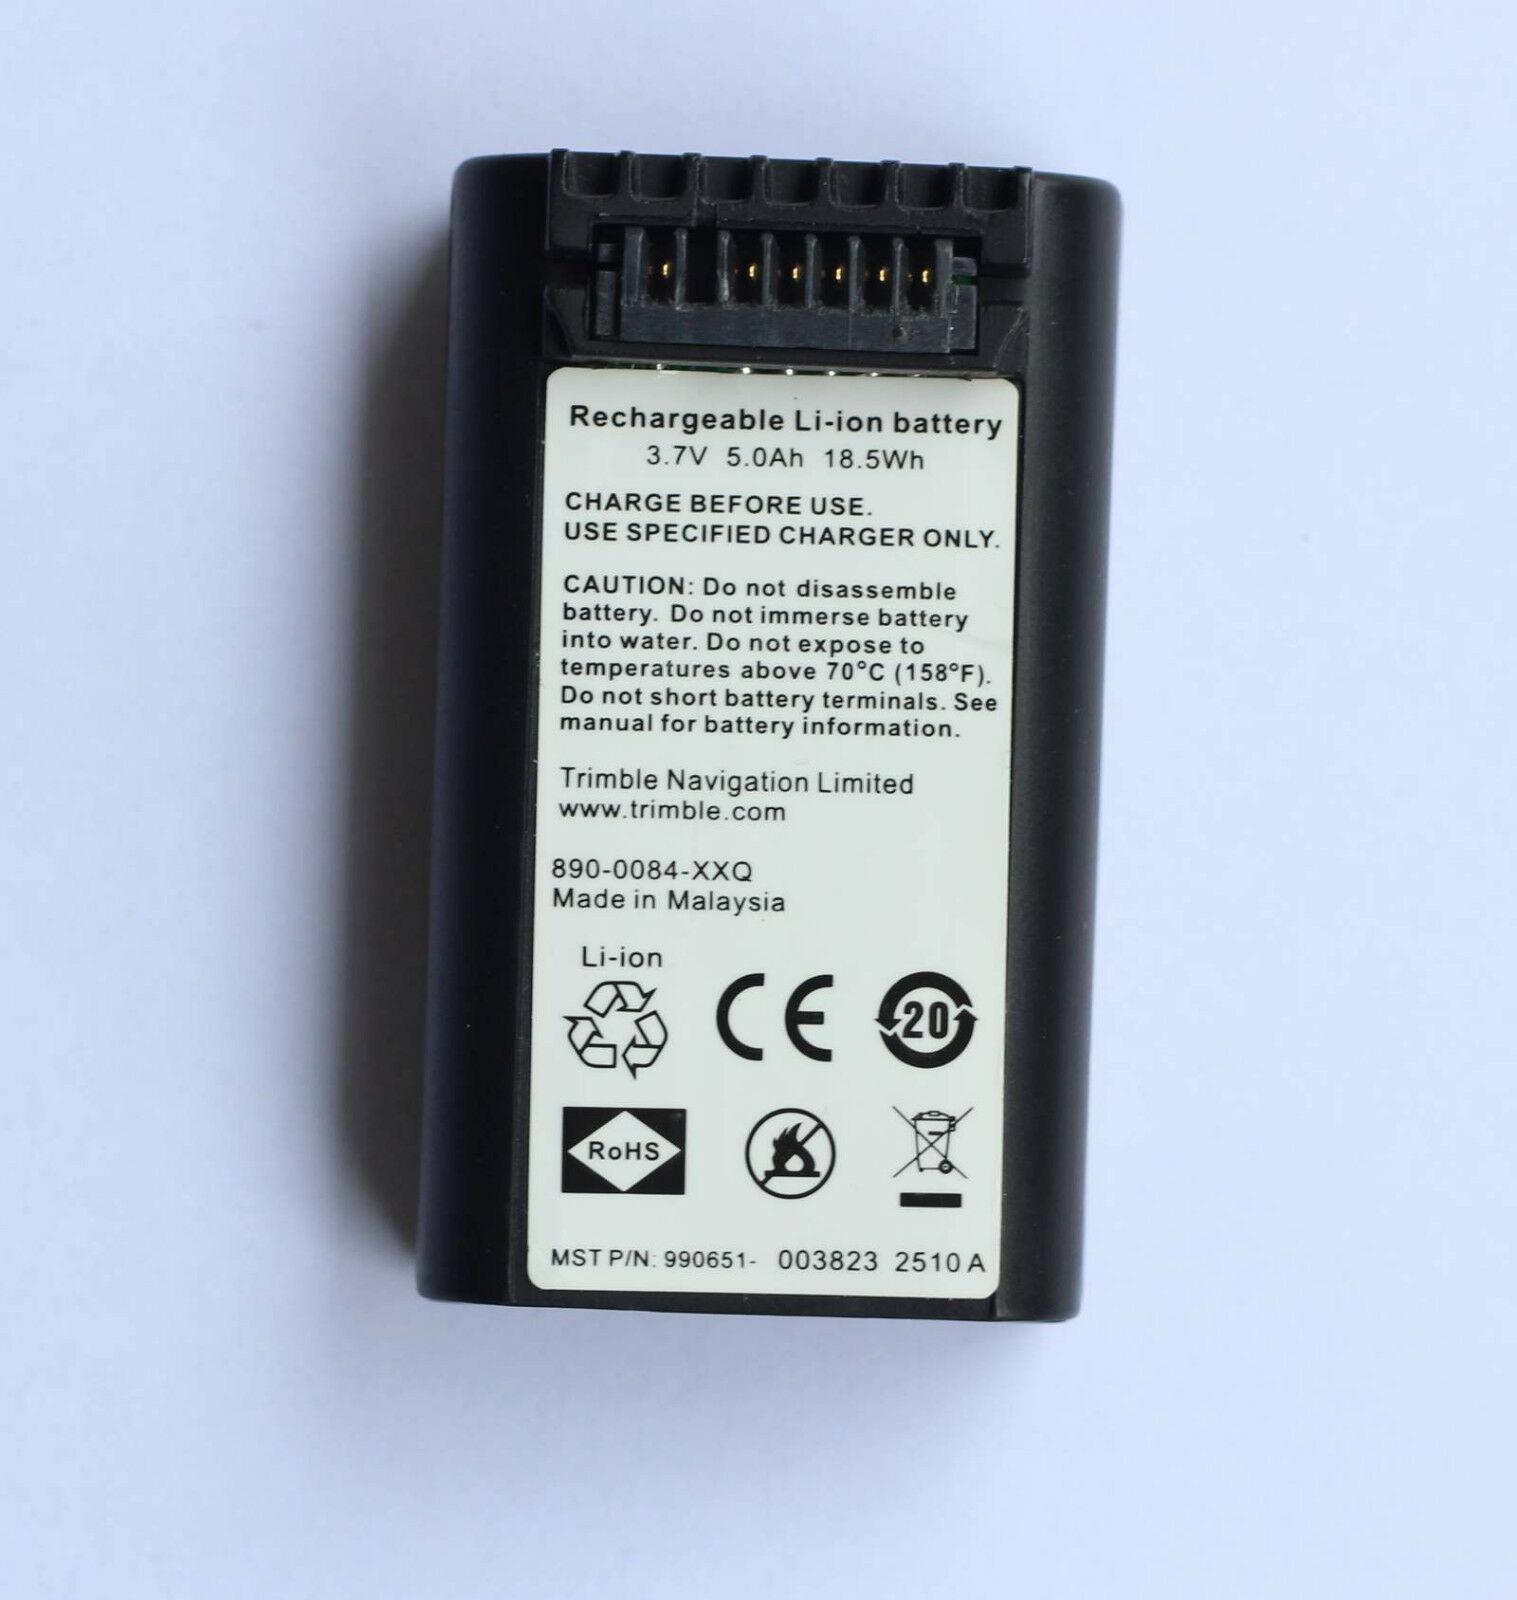 BRAND NEW NIVO 2M/2C Li-ion 3.7V 5000mAh battery for Nikon total station